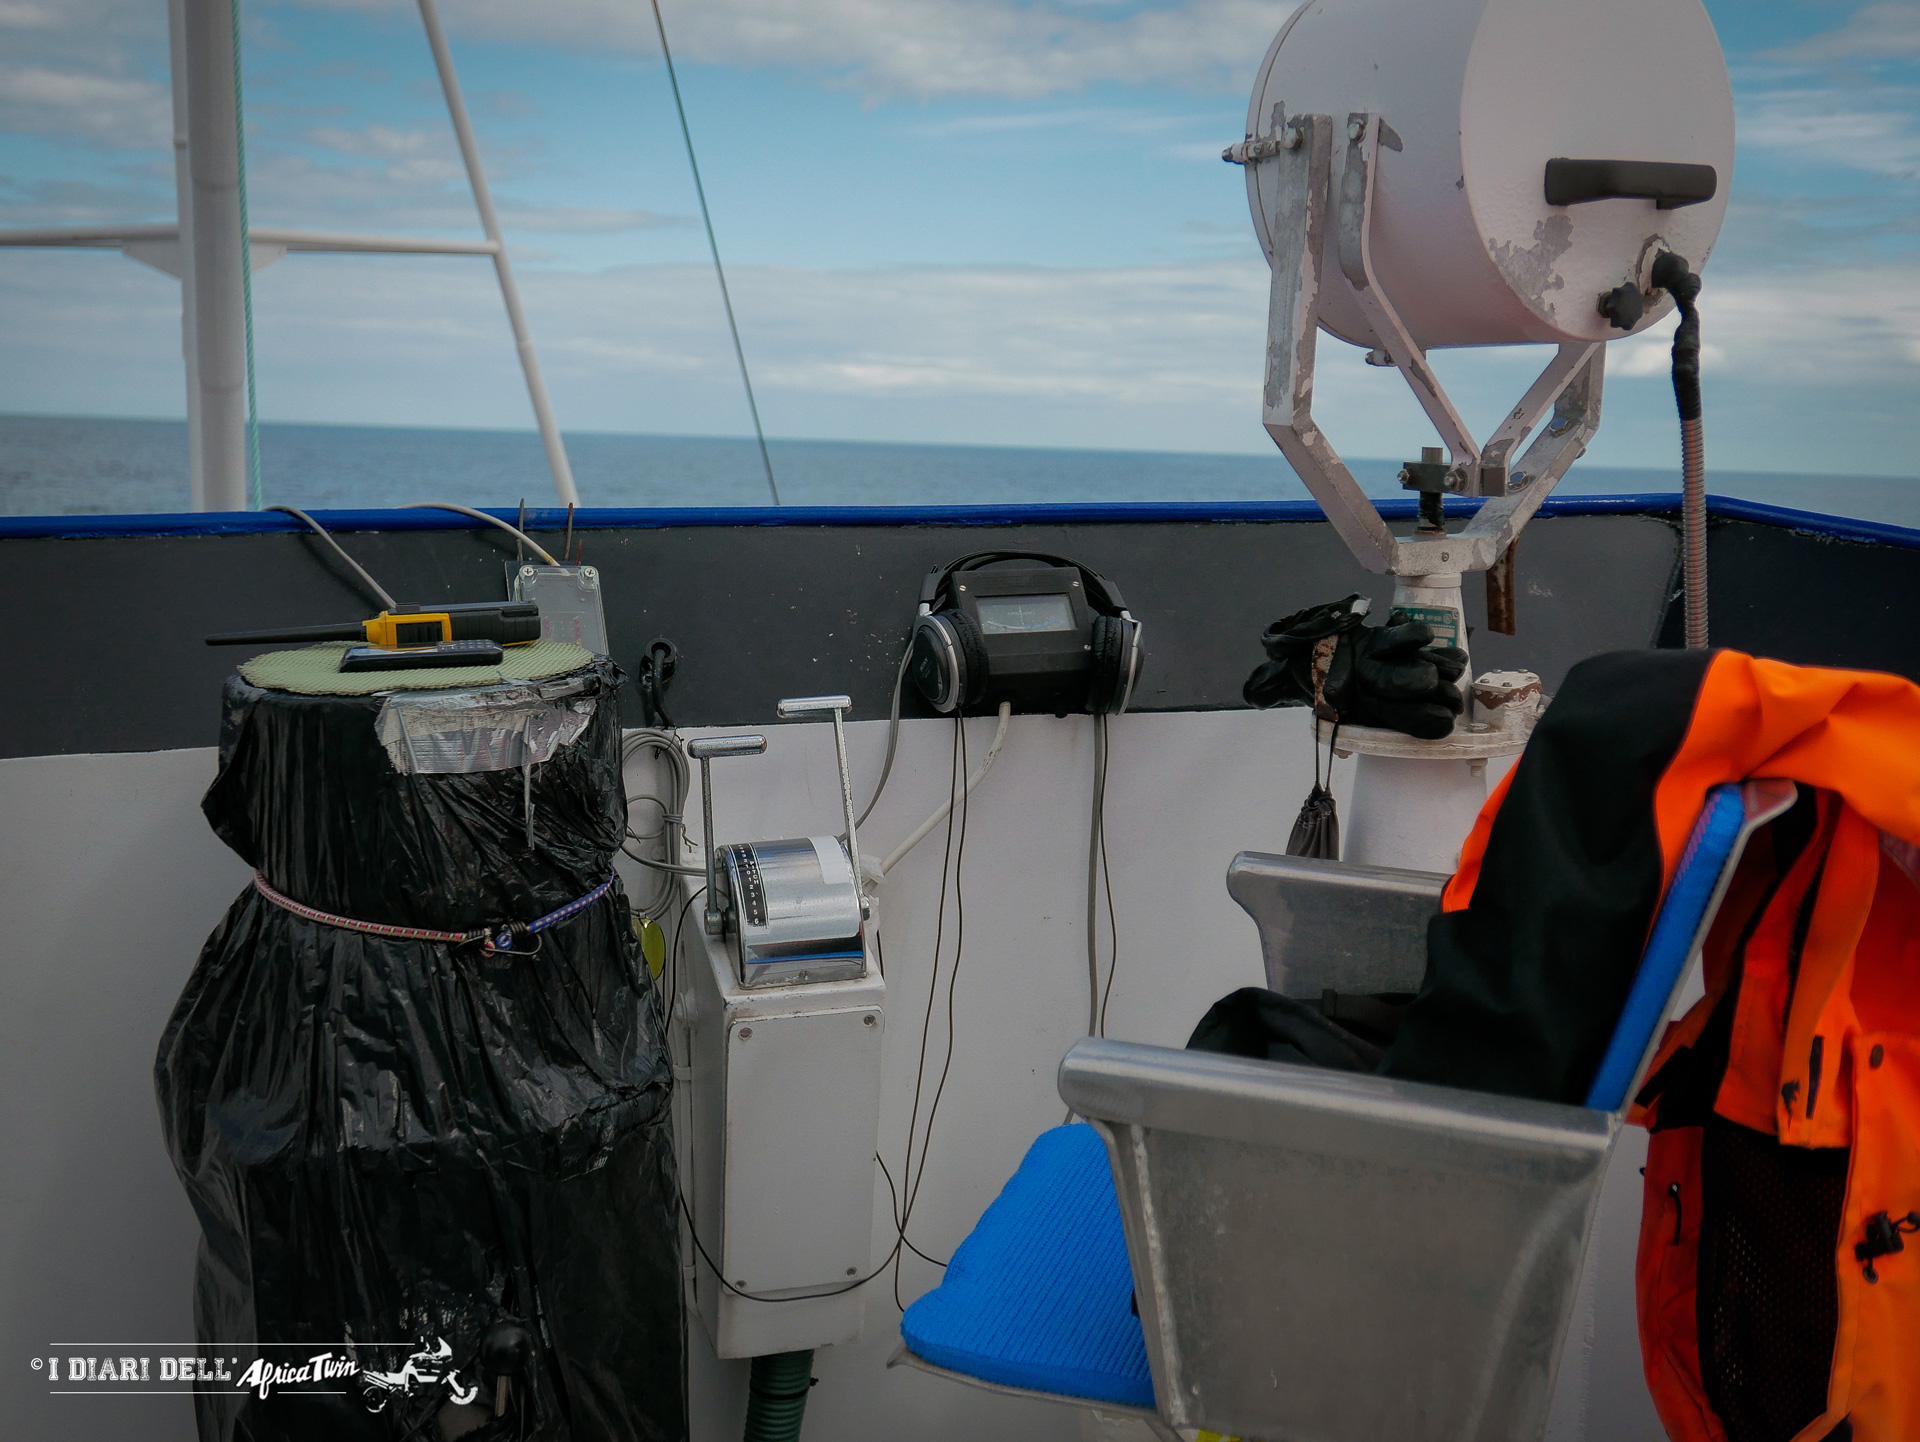 sperm whale capodogli isole lofoten norvegia